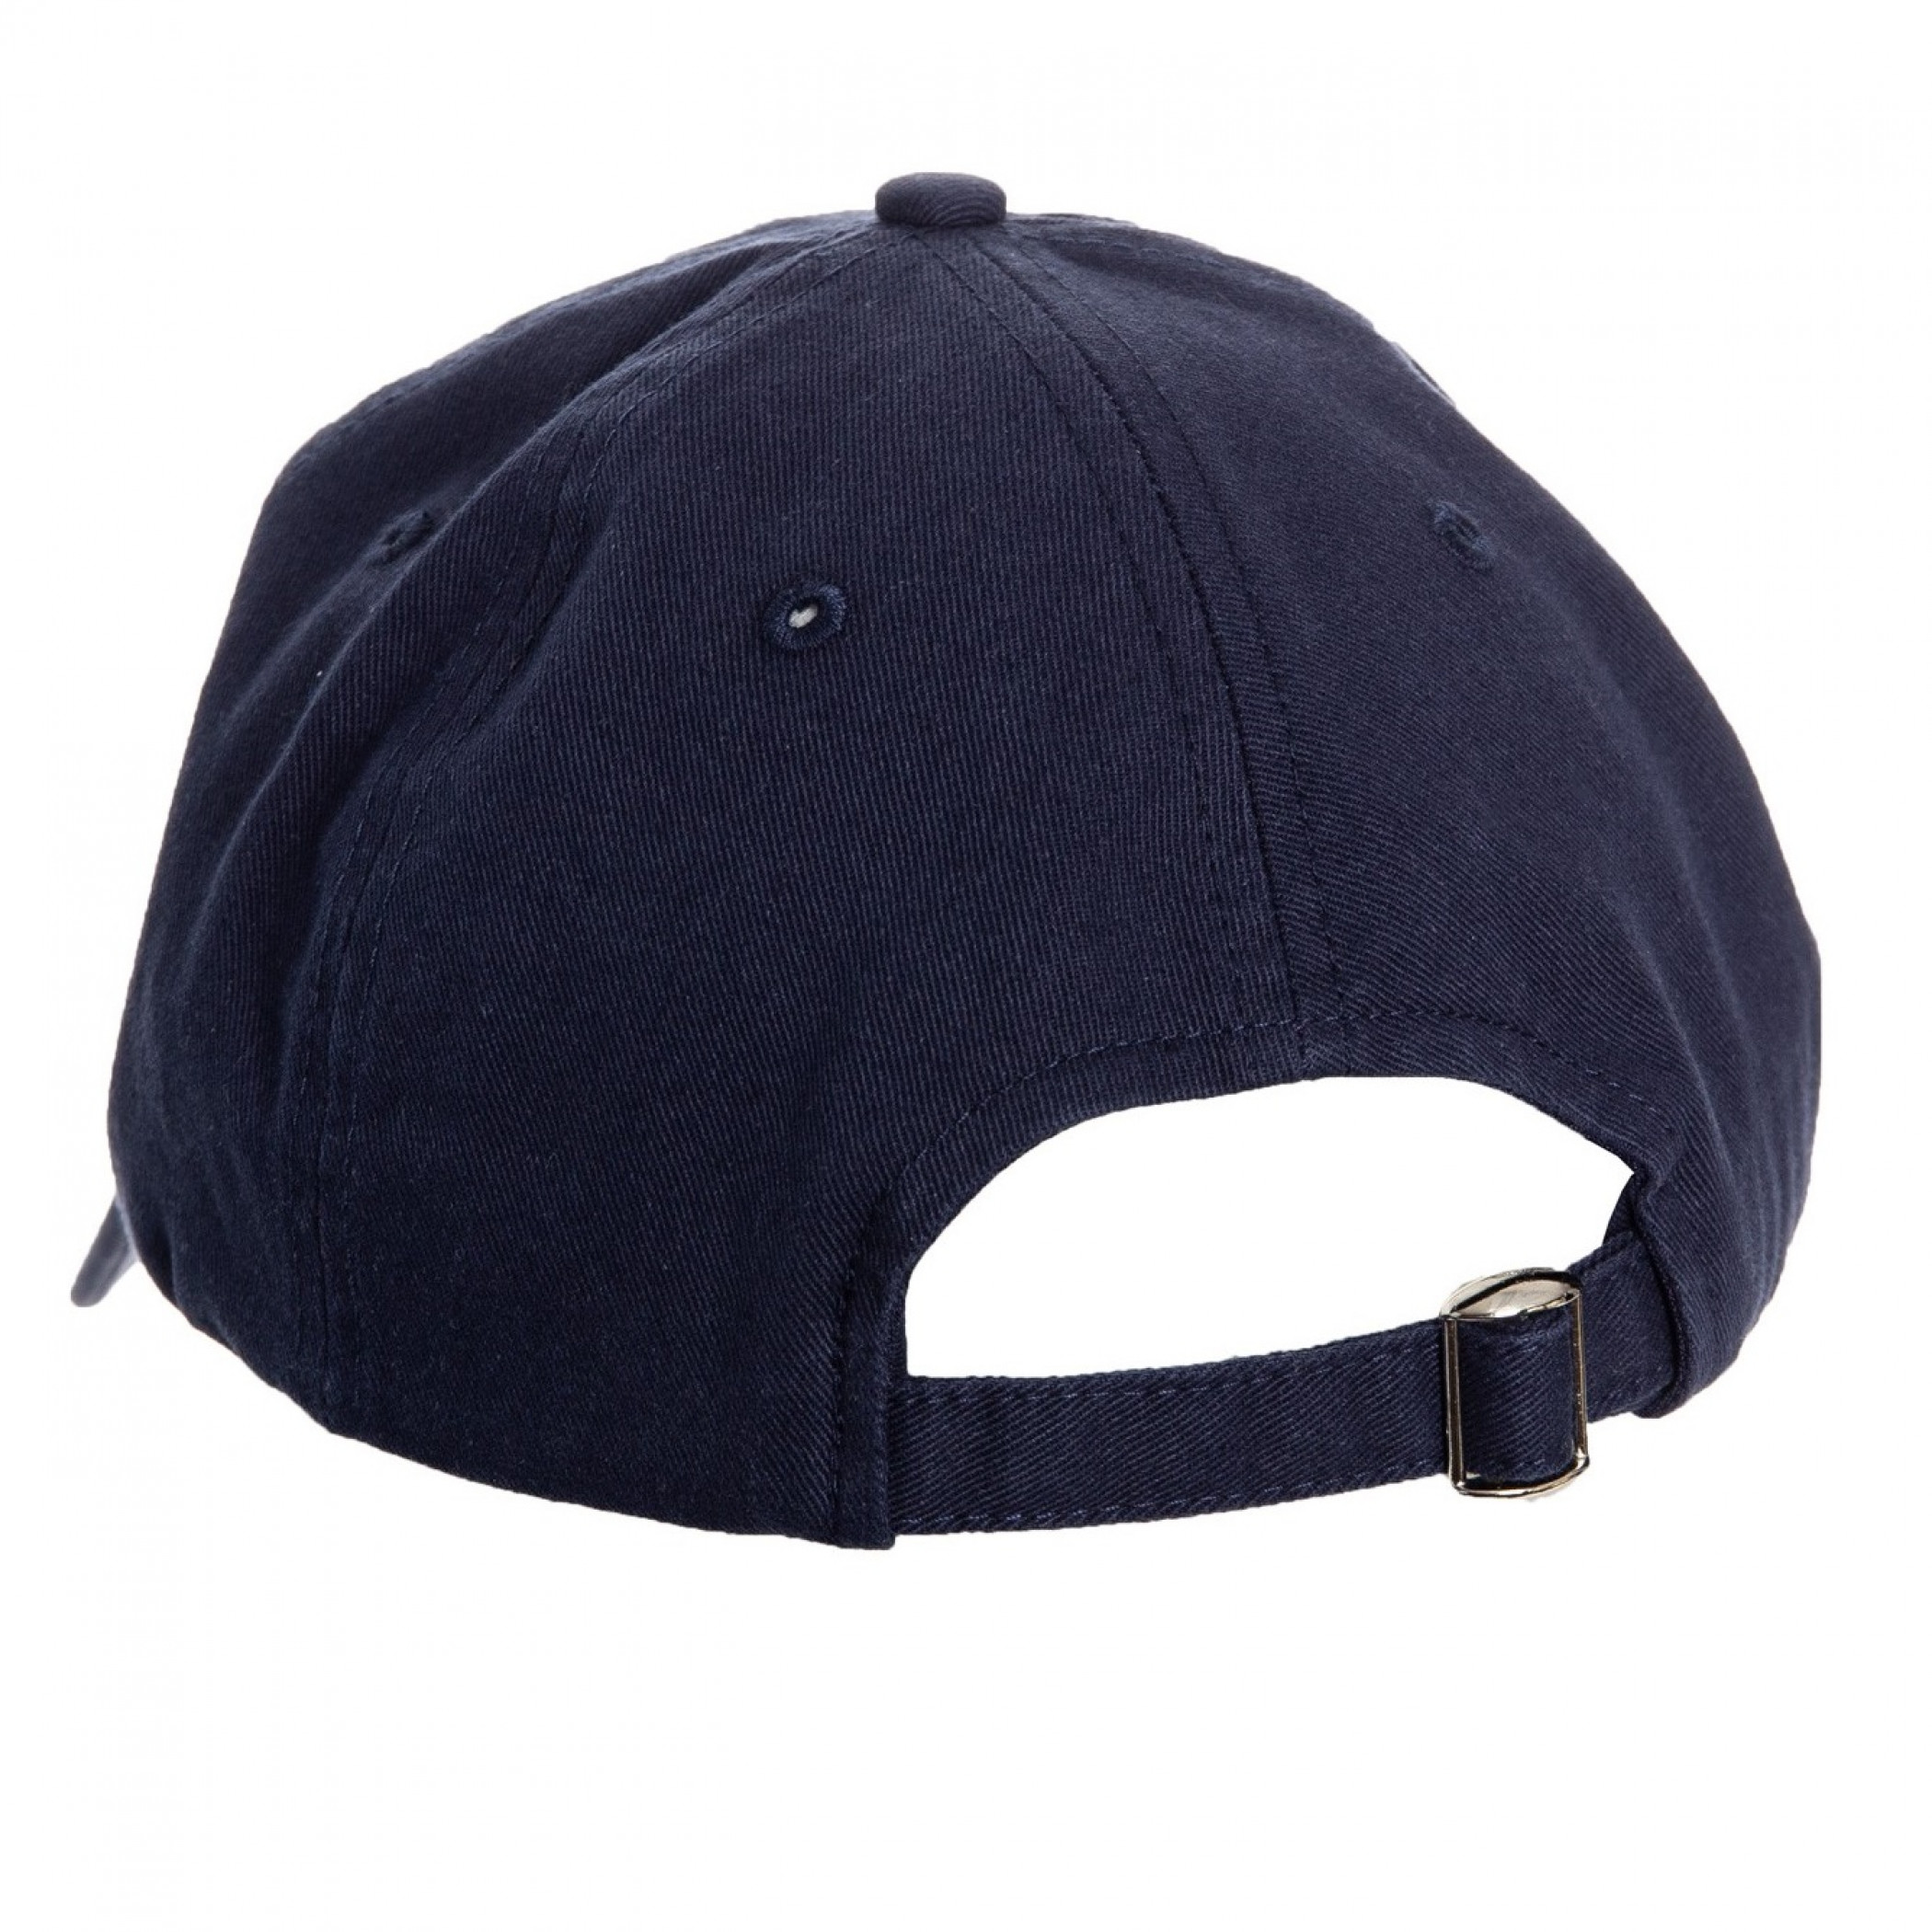 Corona Extra Royal Blue Adjustable Strapback Dad Hat